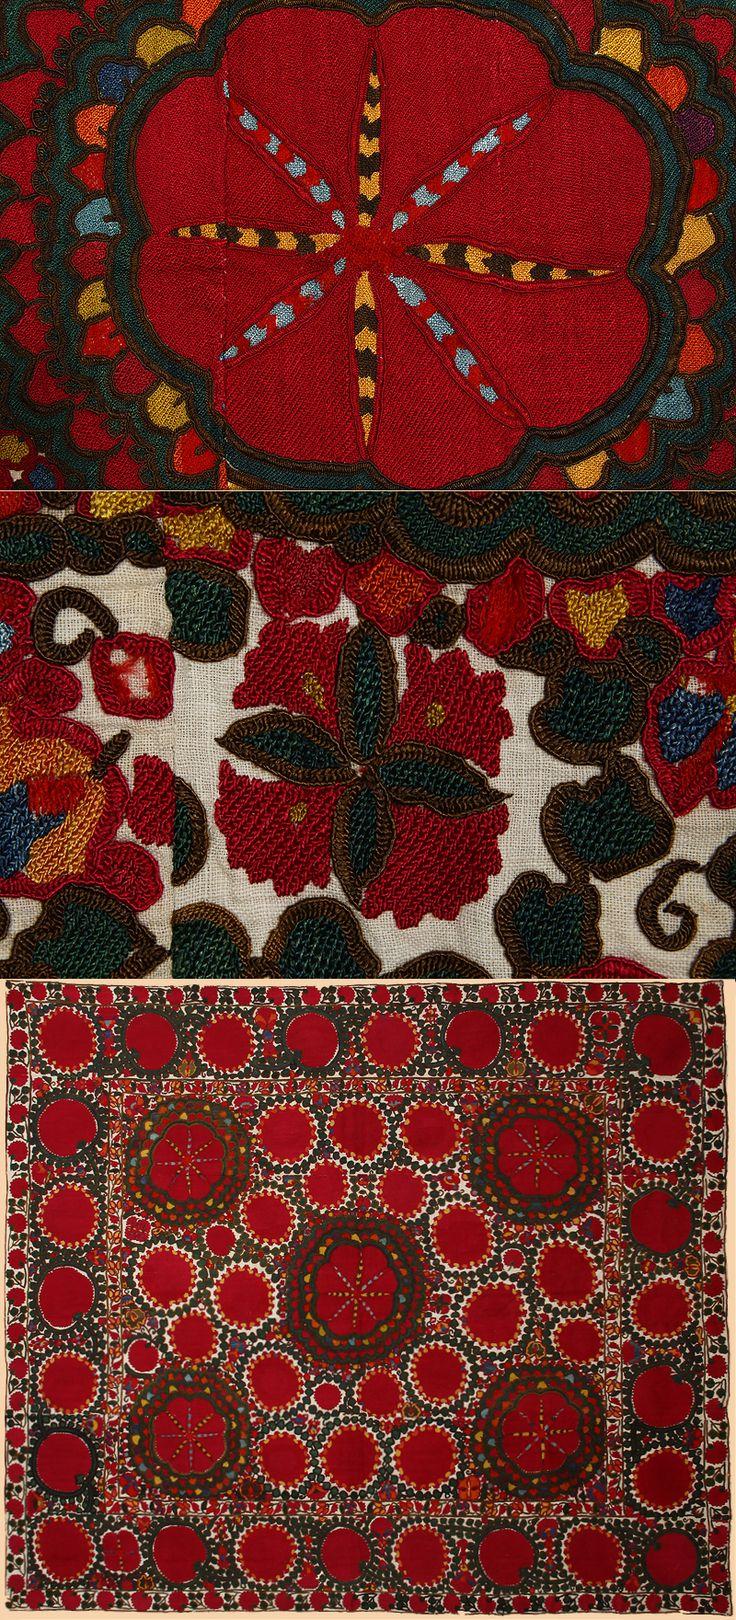 "Antique Central Asian Suzani. Silk Embroidery on Cotton, Circa 1870. Size 87"" x 78"", 221 x 198 cm"